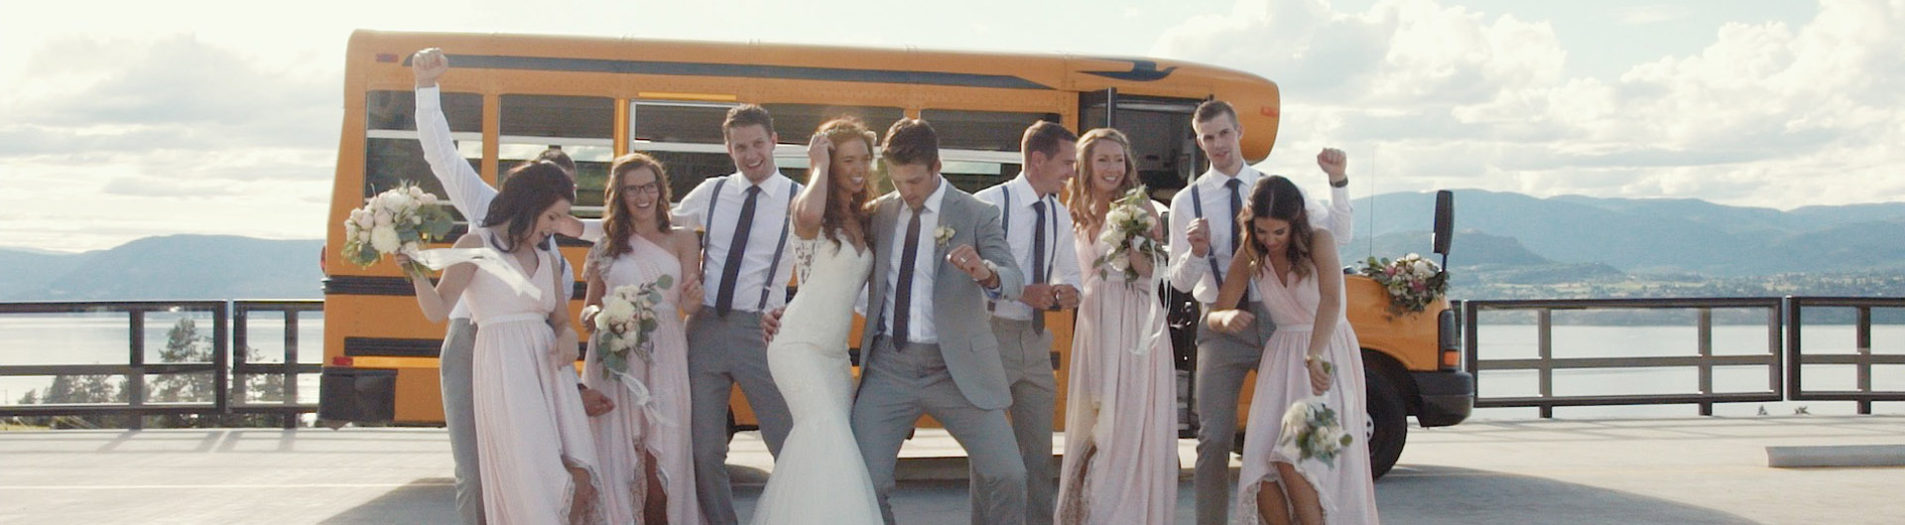 Giselle & Brandon | Wedding Highlight Film | Summerhill Winery, Kelowna BC